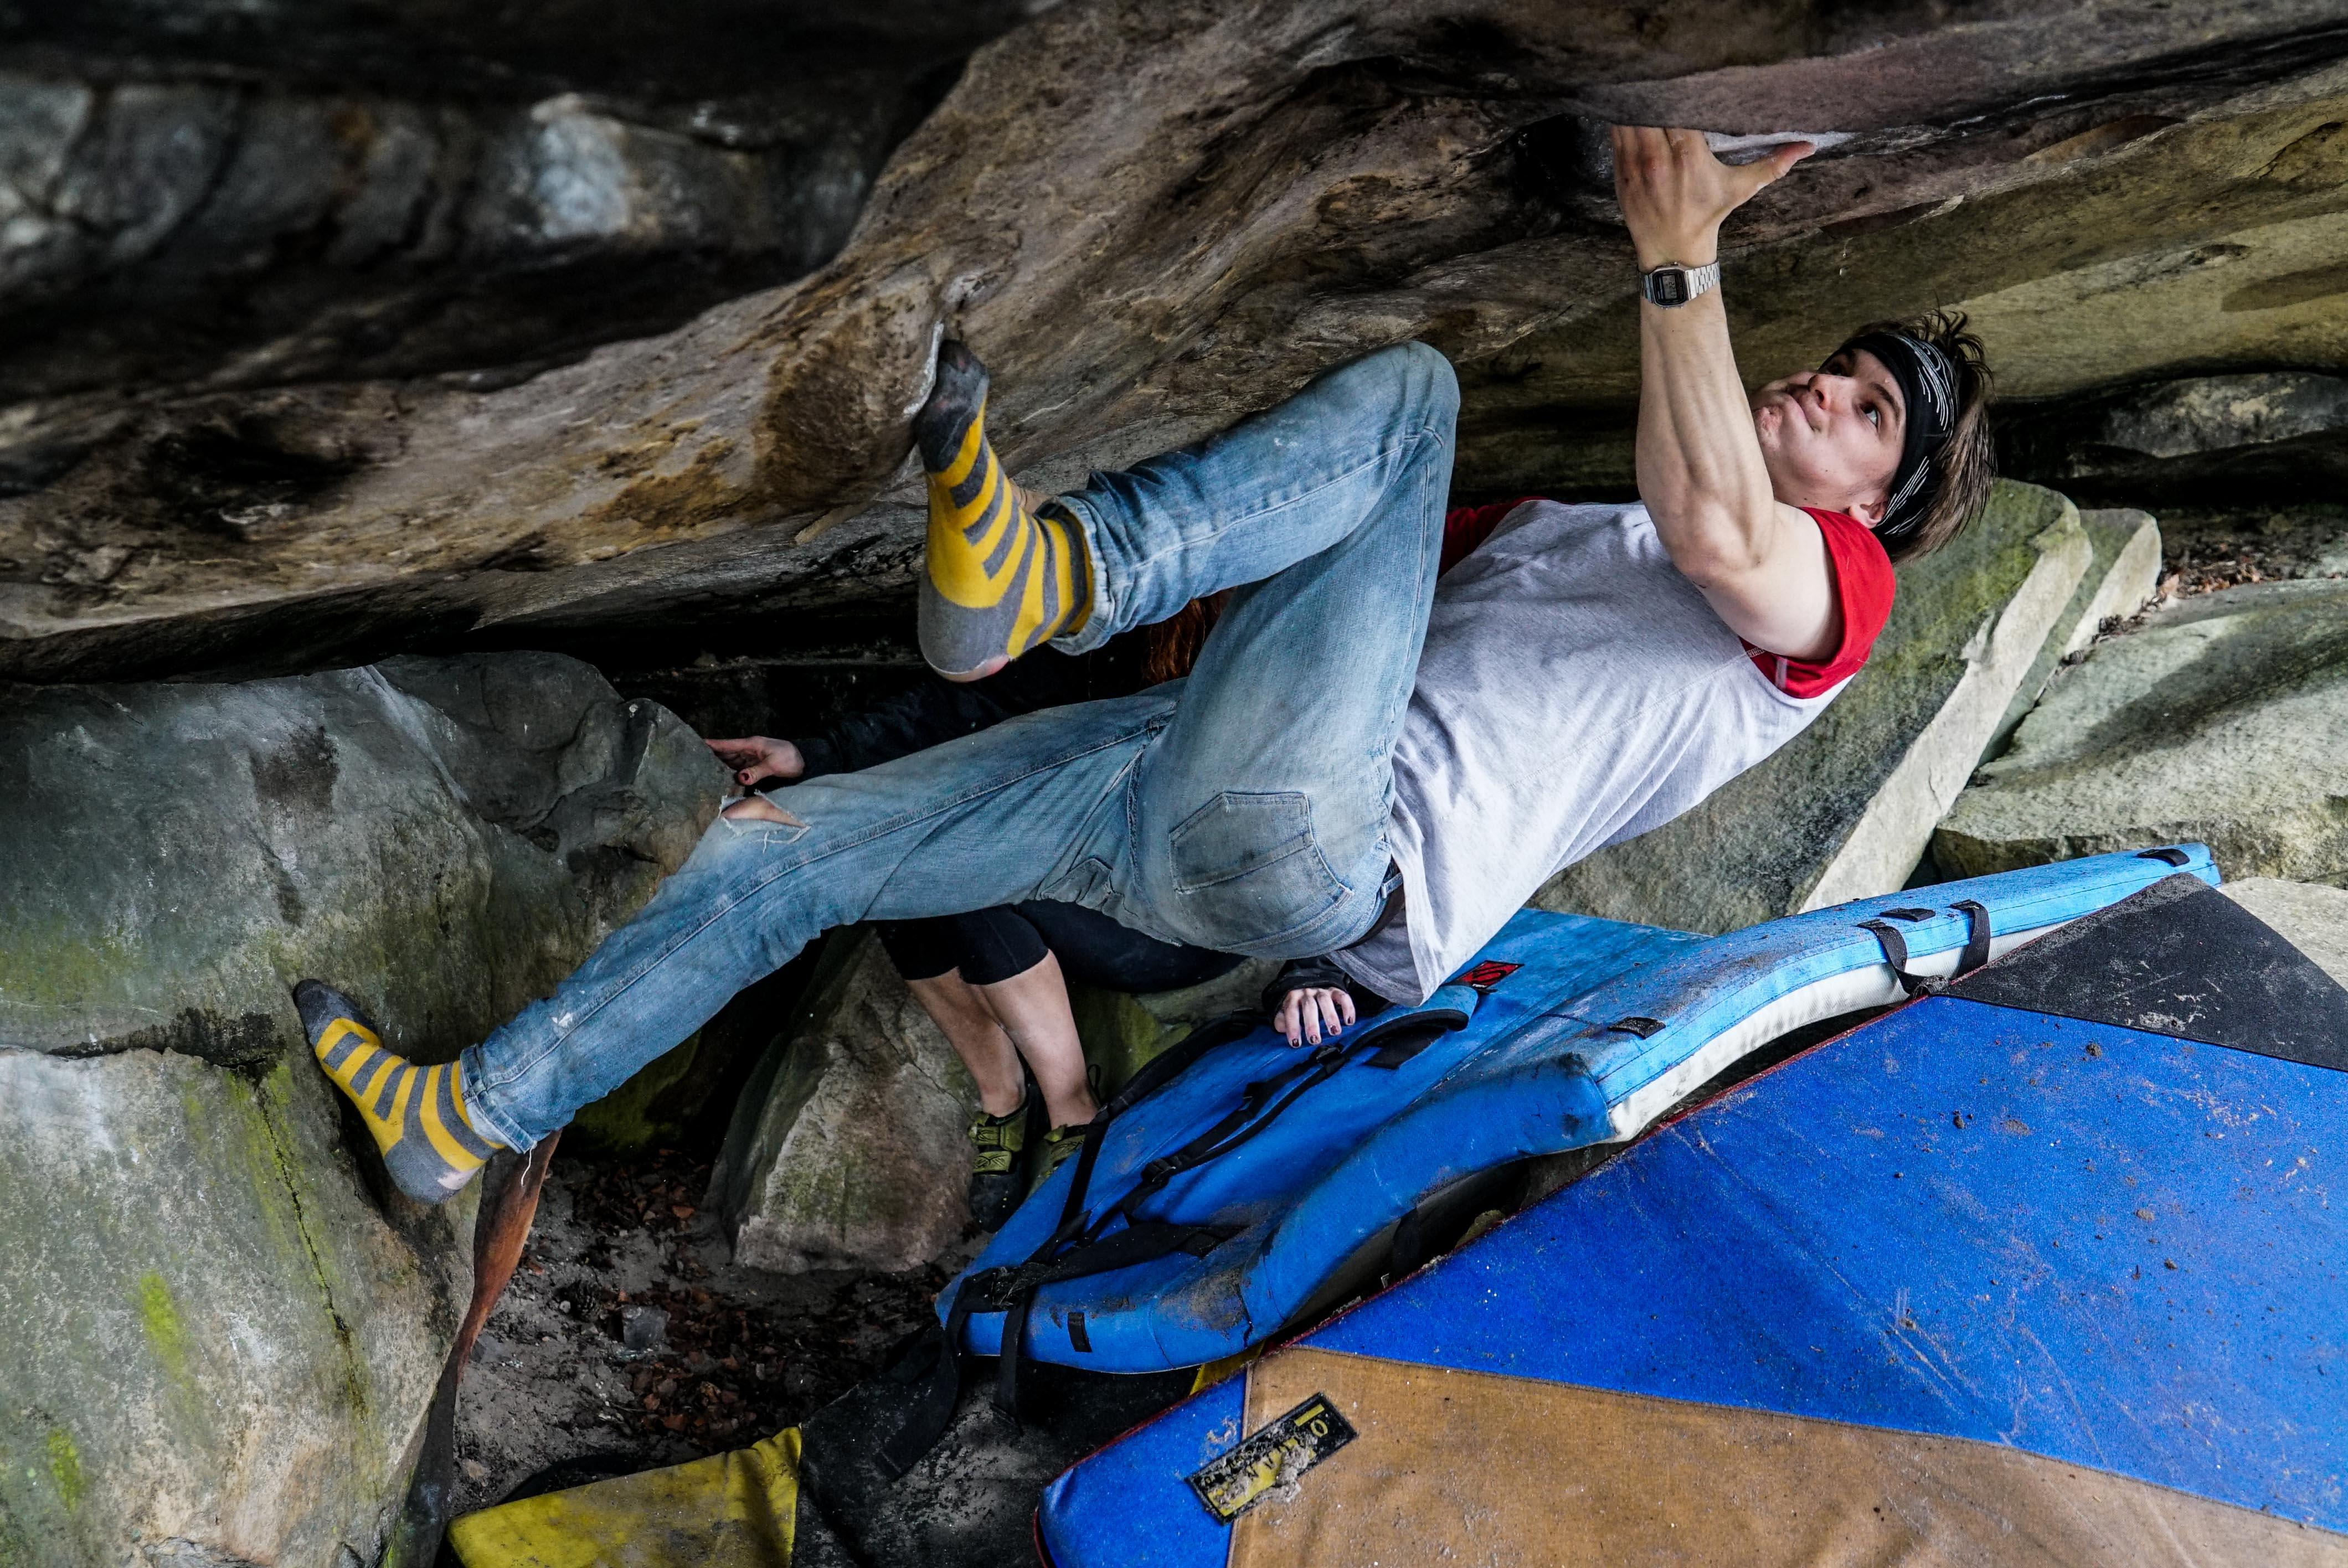 fontainbleau climbing 2016 mike brindley-31